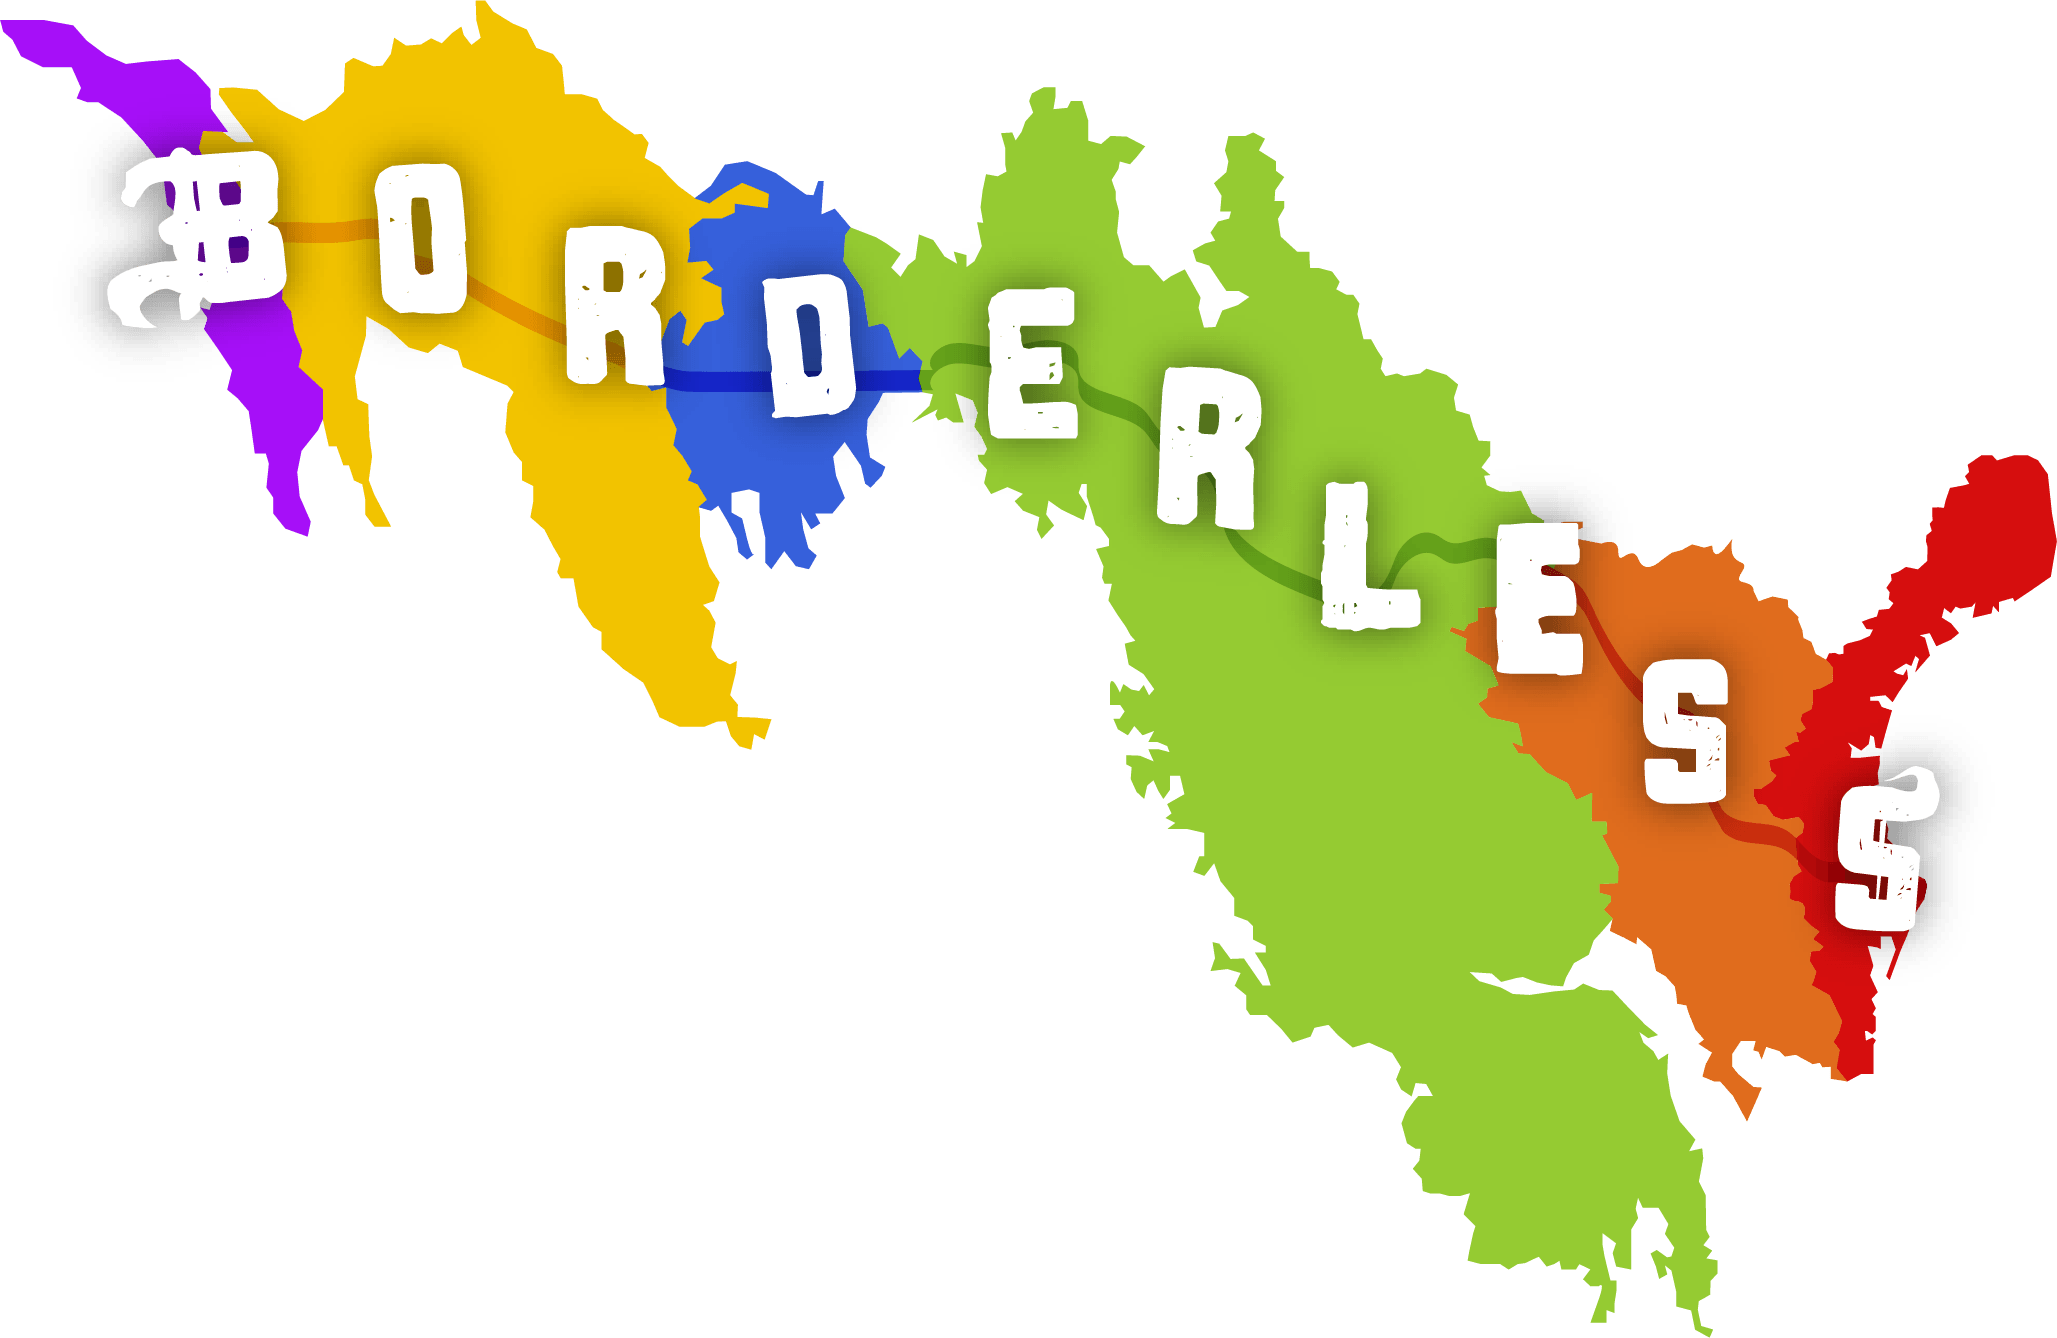 Borderless Cultures